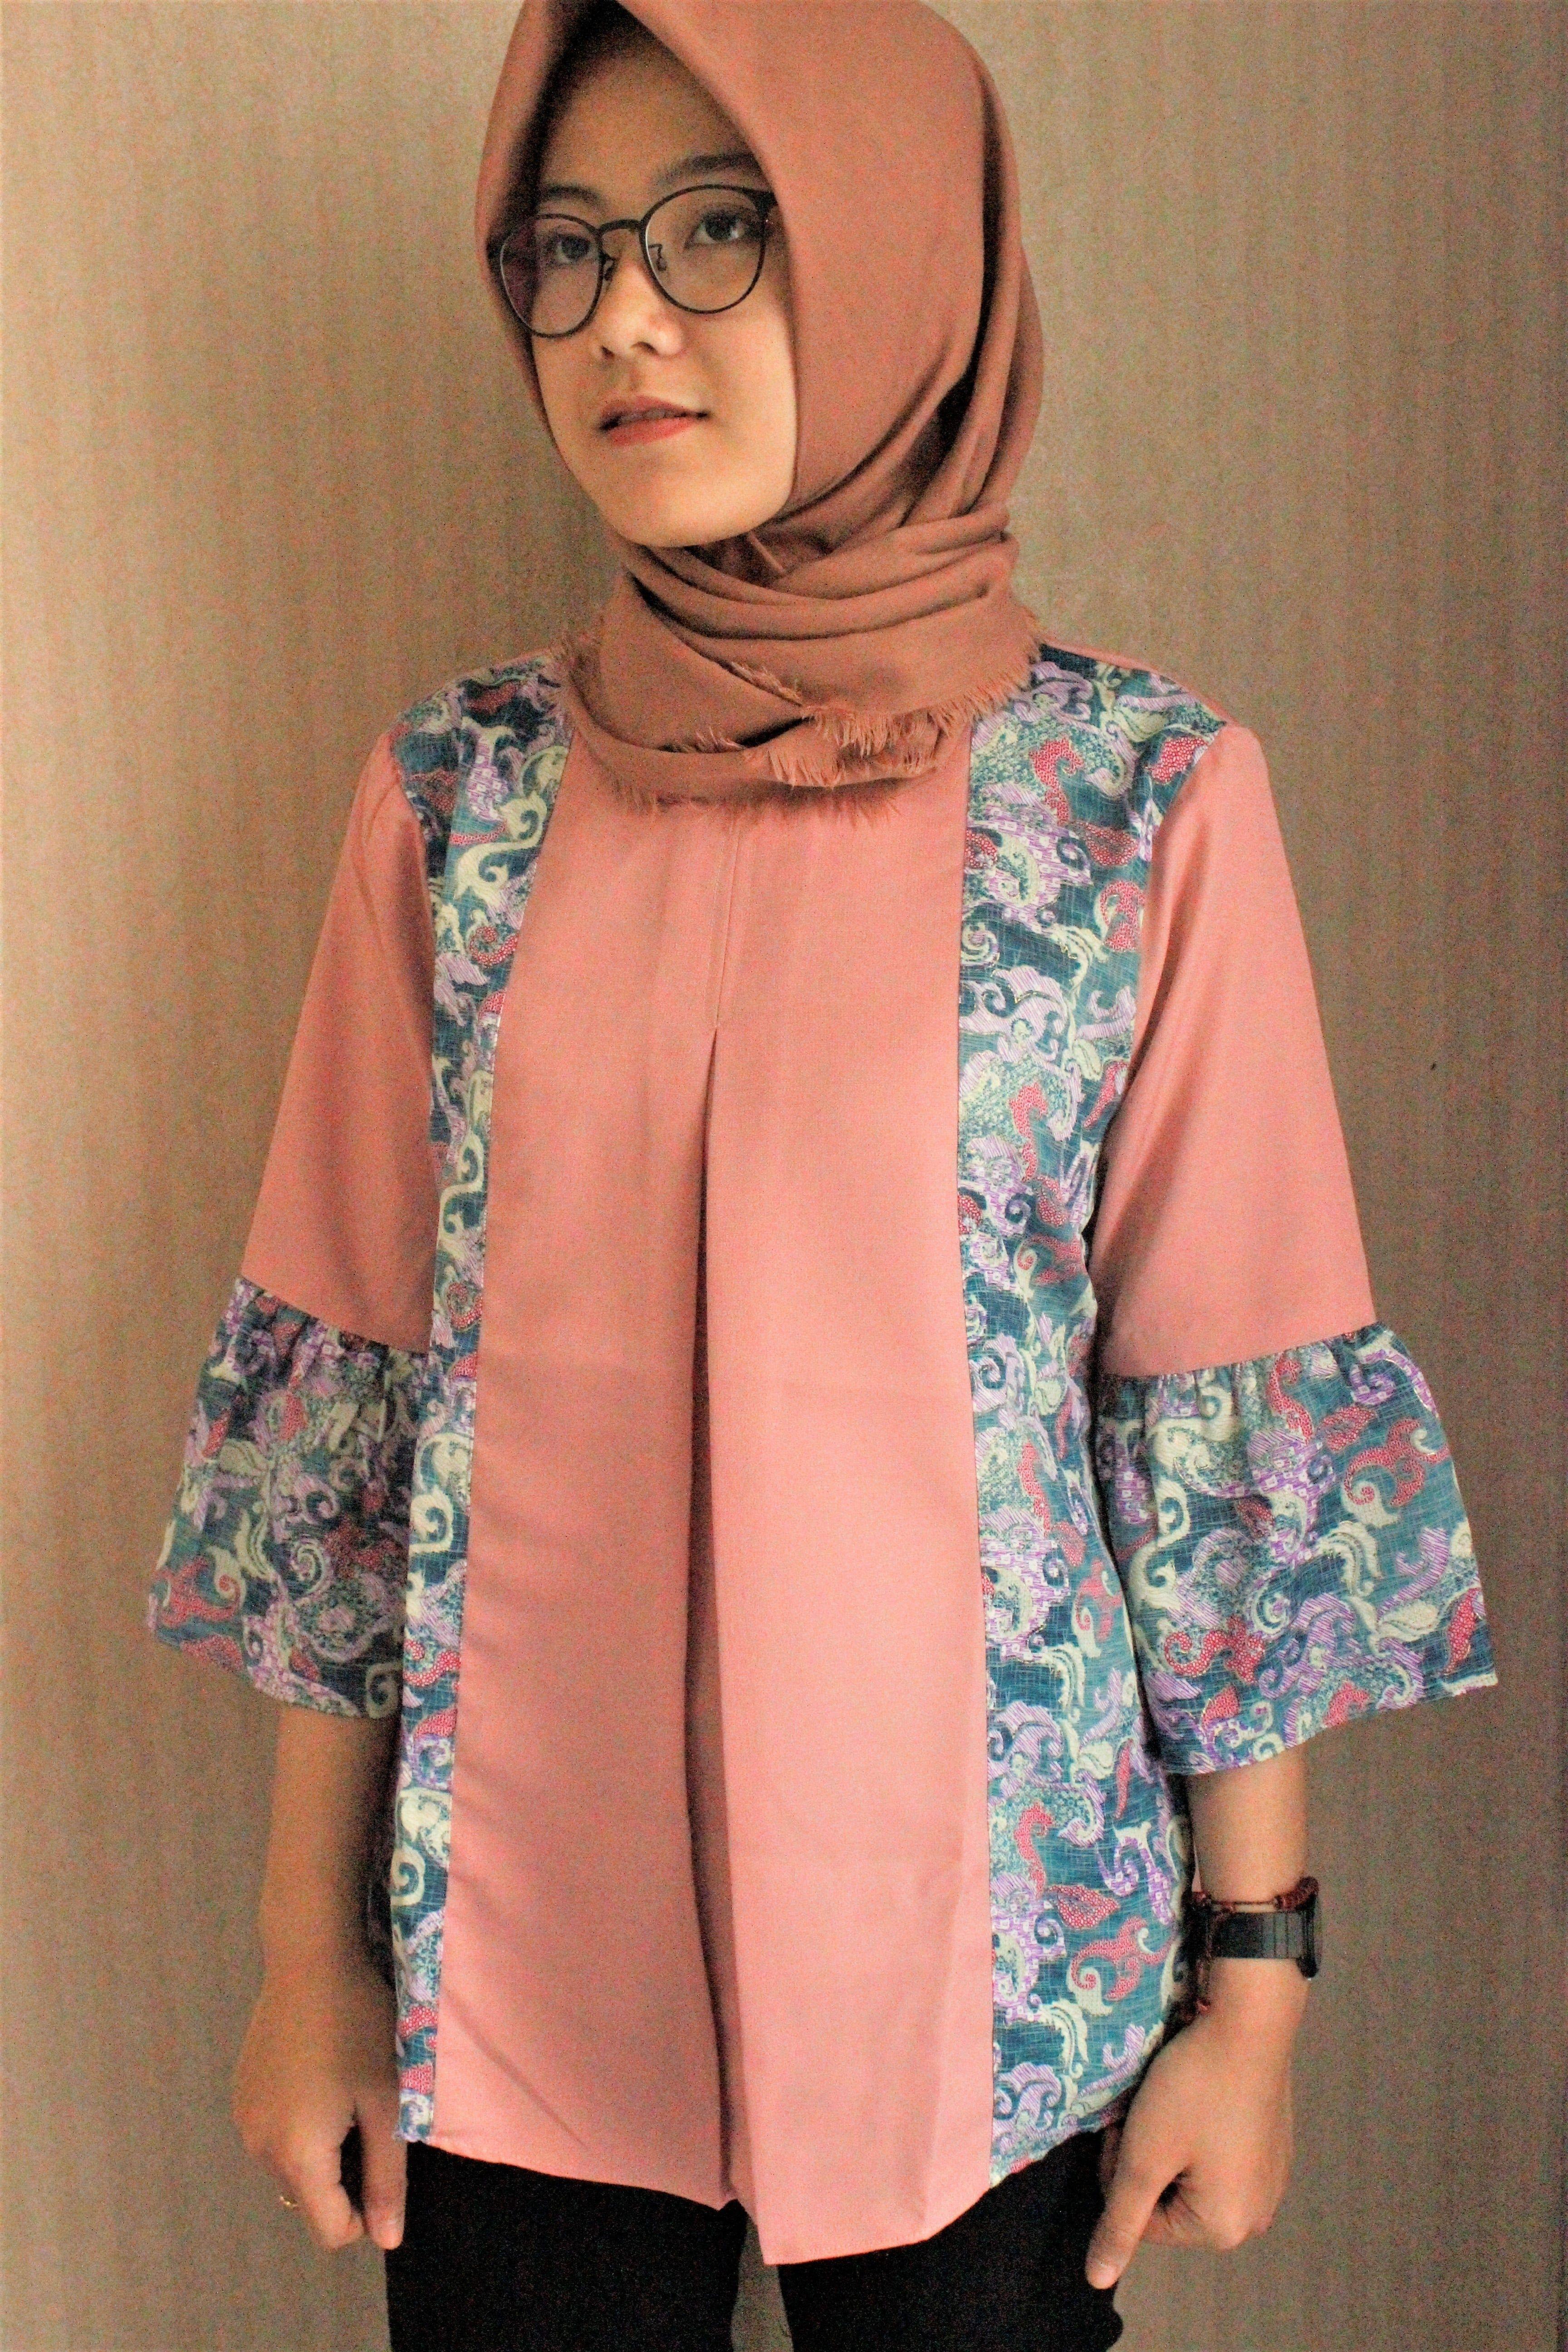 Model Baju Batik Modern Untuk Ibu Hamil di 2020 | Model ...